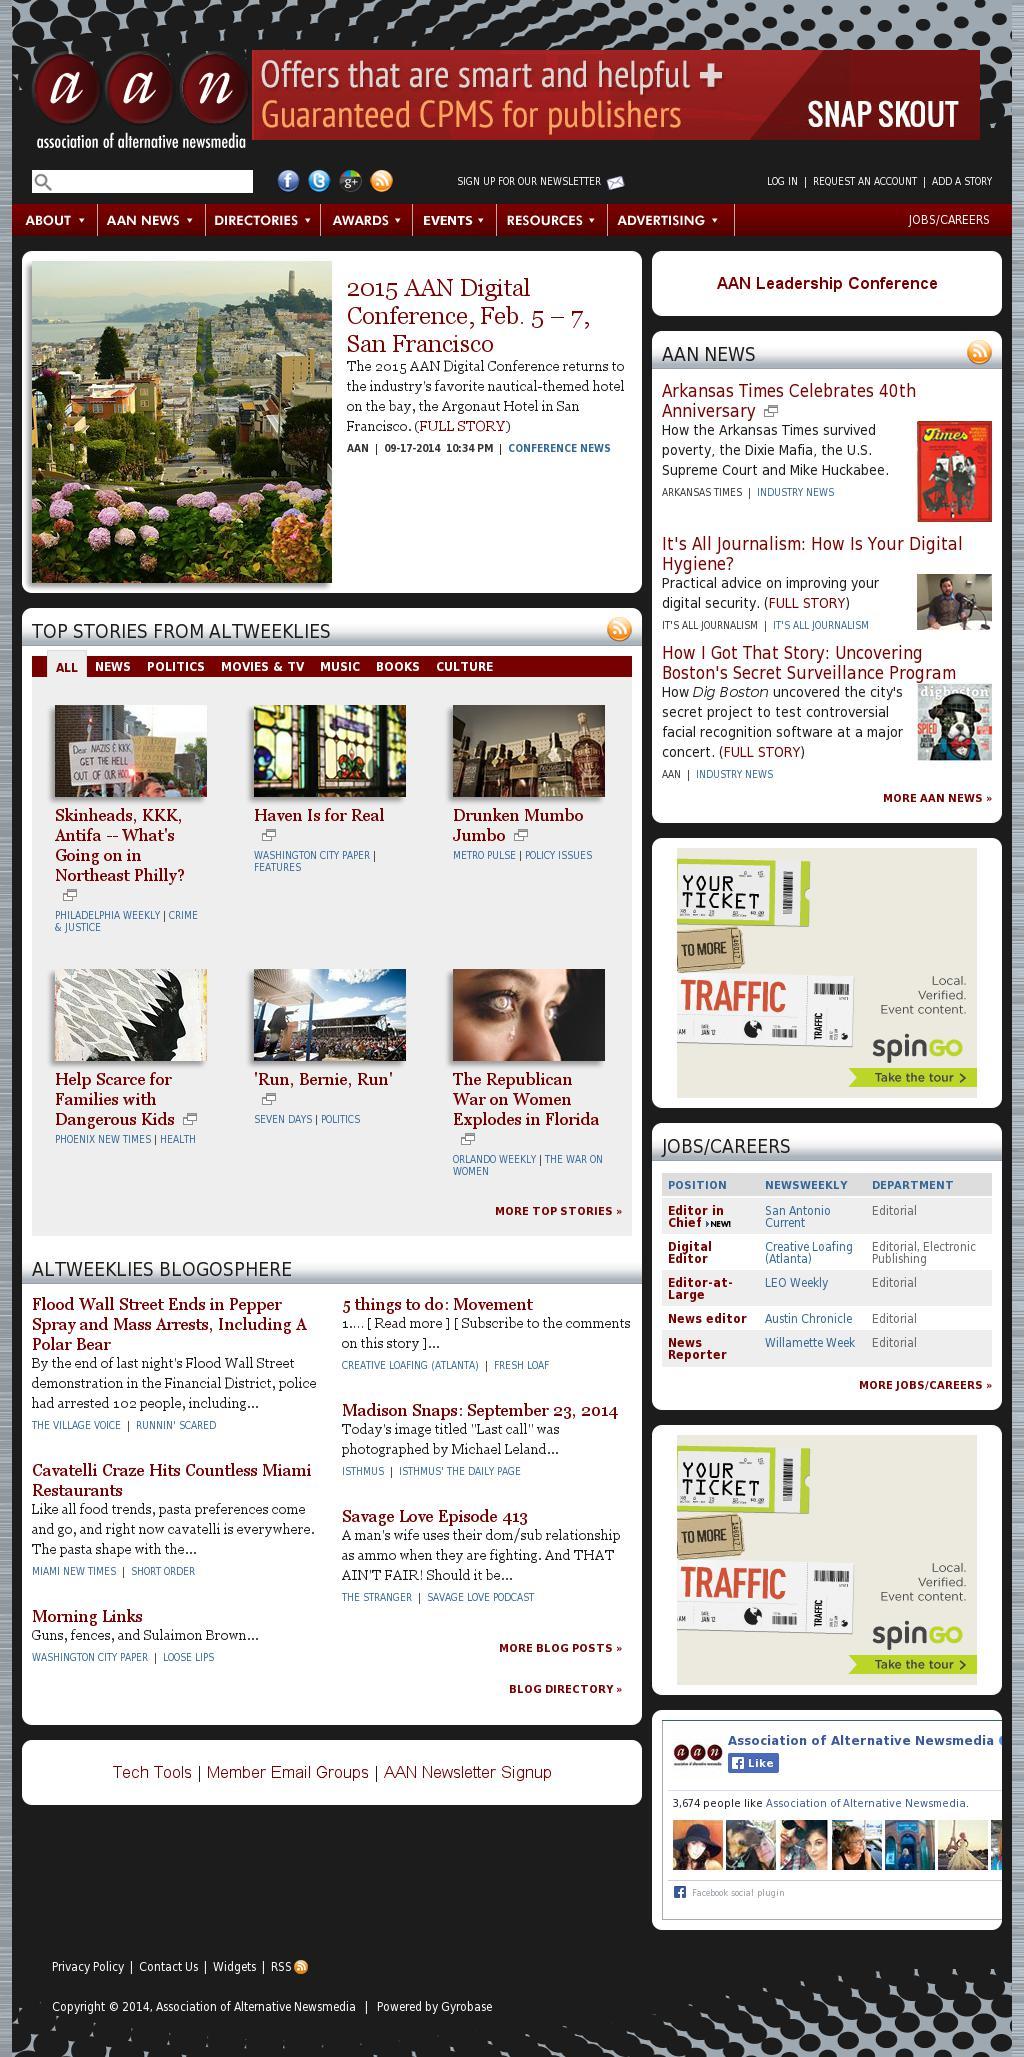 Association of Alternative Newsmedia at Tuesday Sept. 23, 2014, 4 p.m. UTC